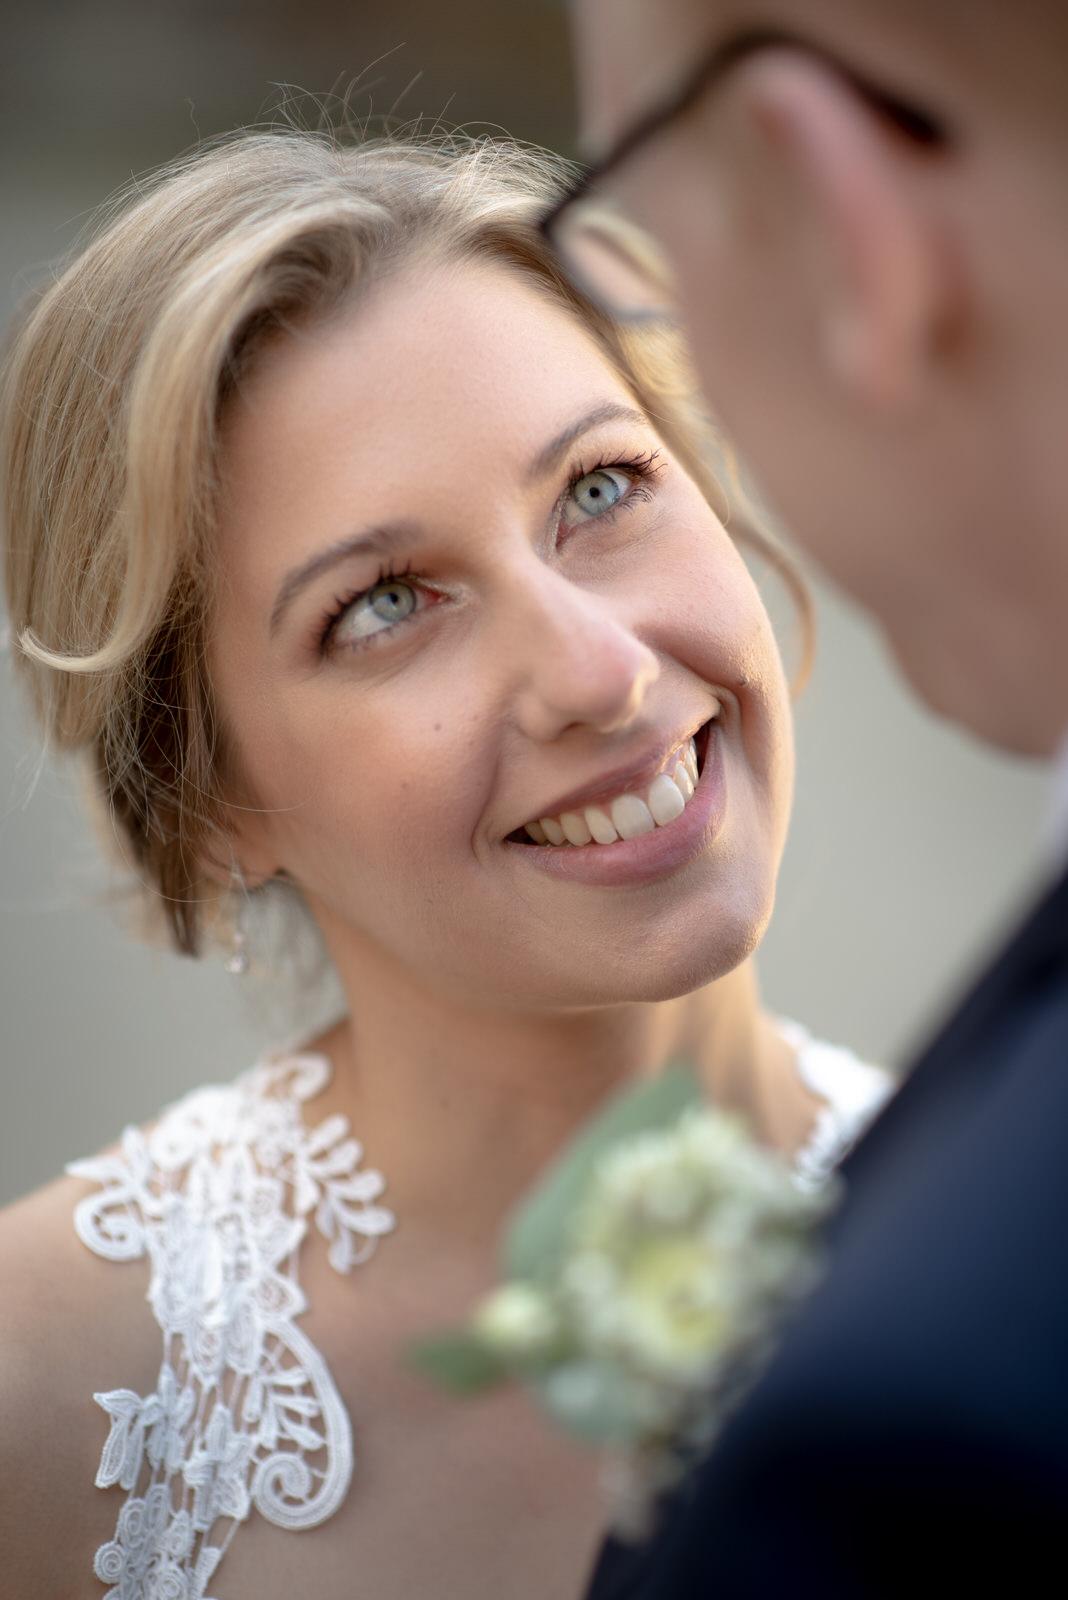 20191012_Hochzeit_Annika&Olaf_Jpgs_bearb